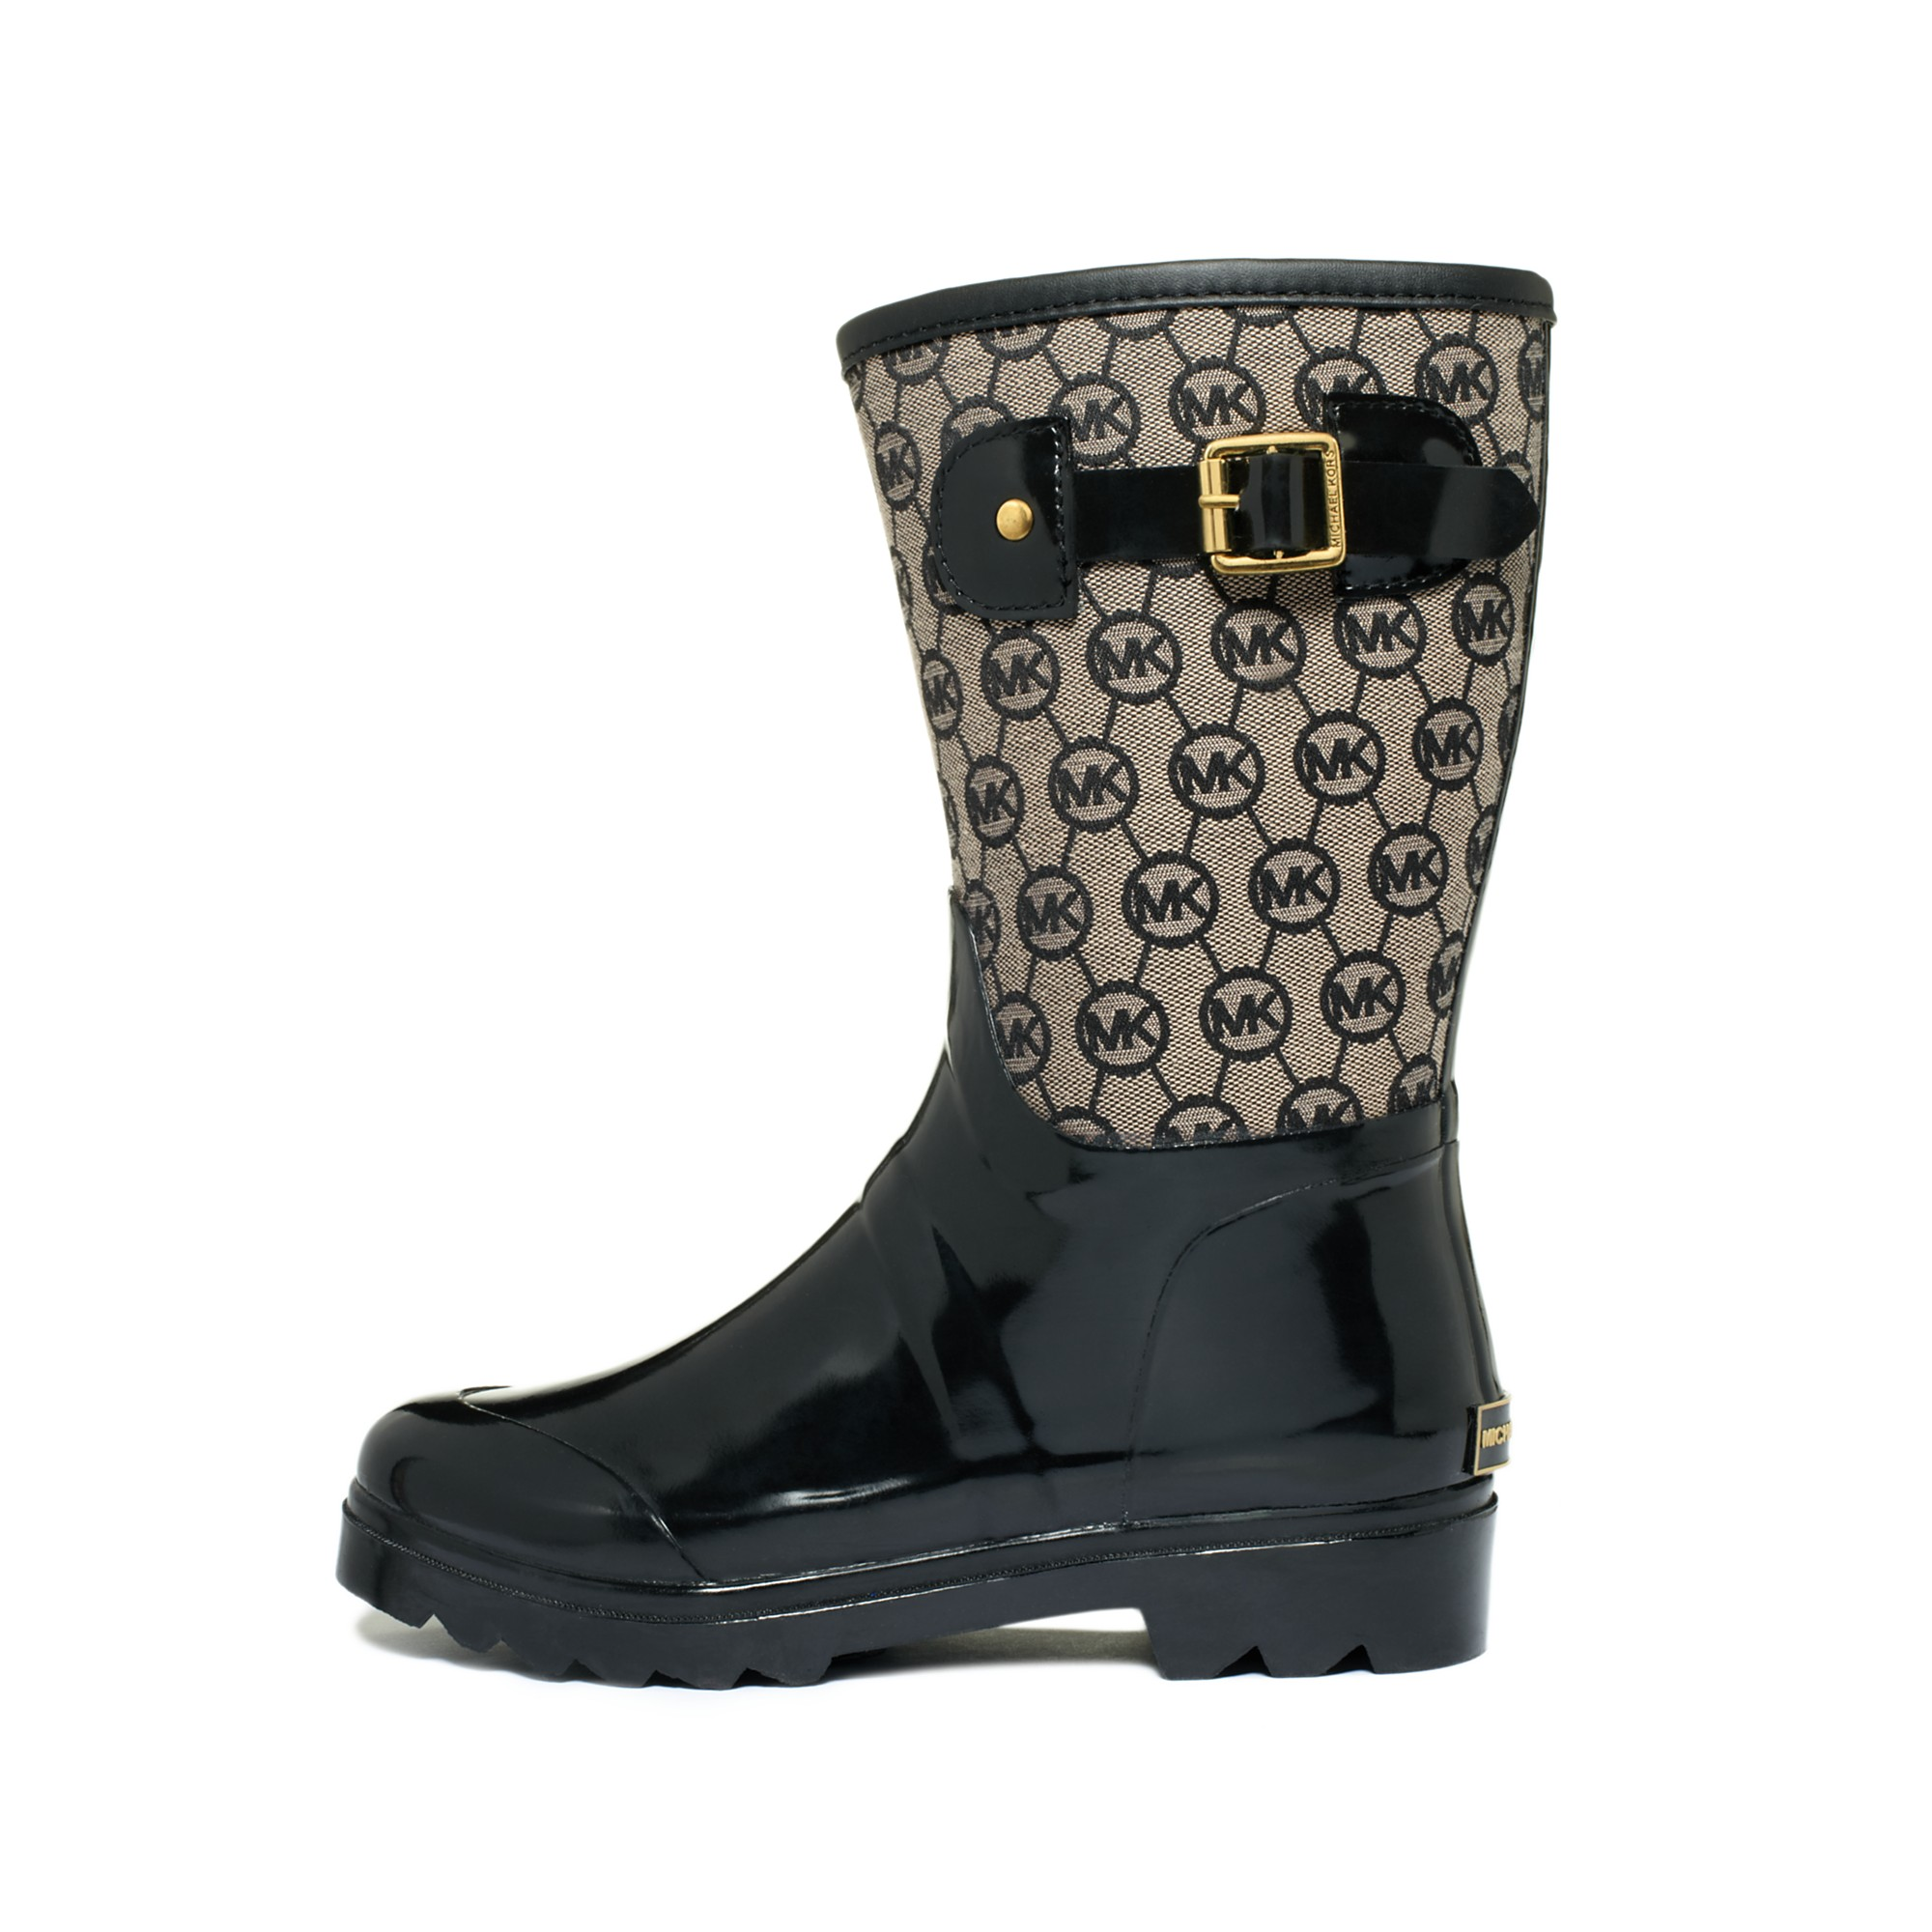 michael kors monogram mid rain boots in black lyst. Black Bedroom Furniture Sets. Home Design Ideas